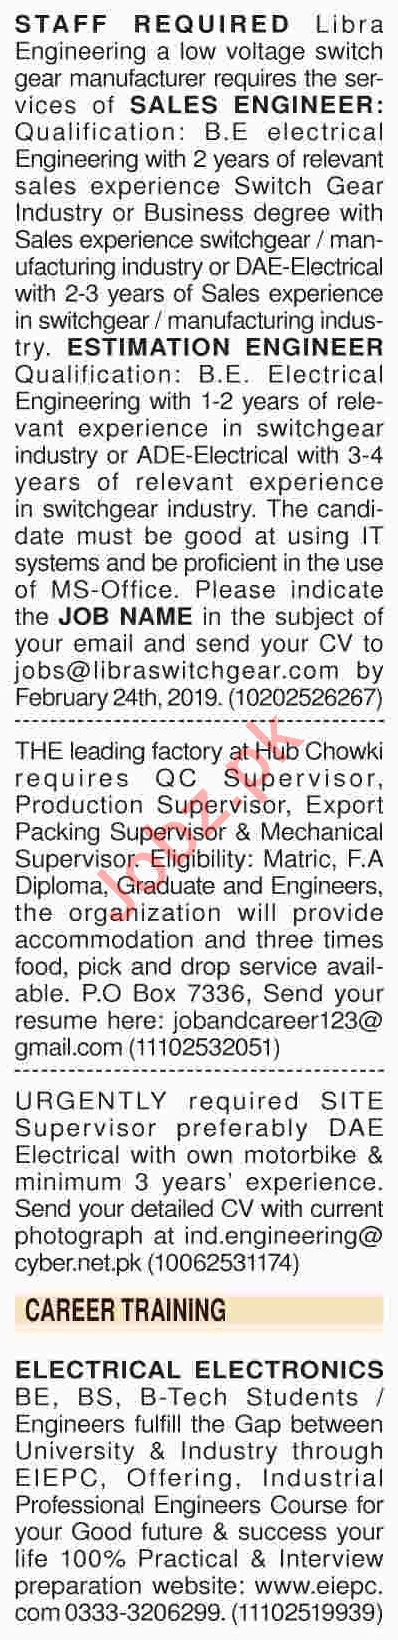 Dawn Sunday Classified Ads 17th Feb 2019 Engineering Staff